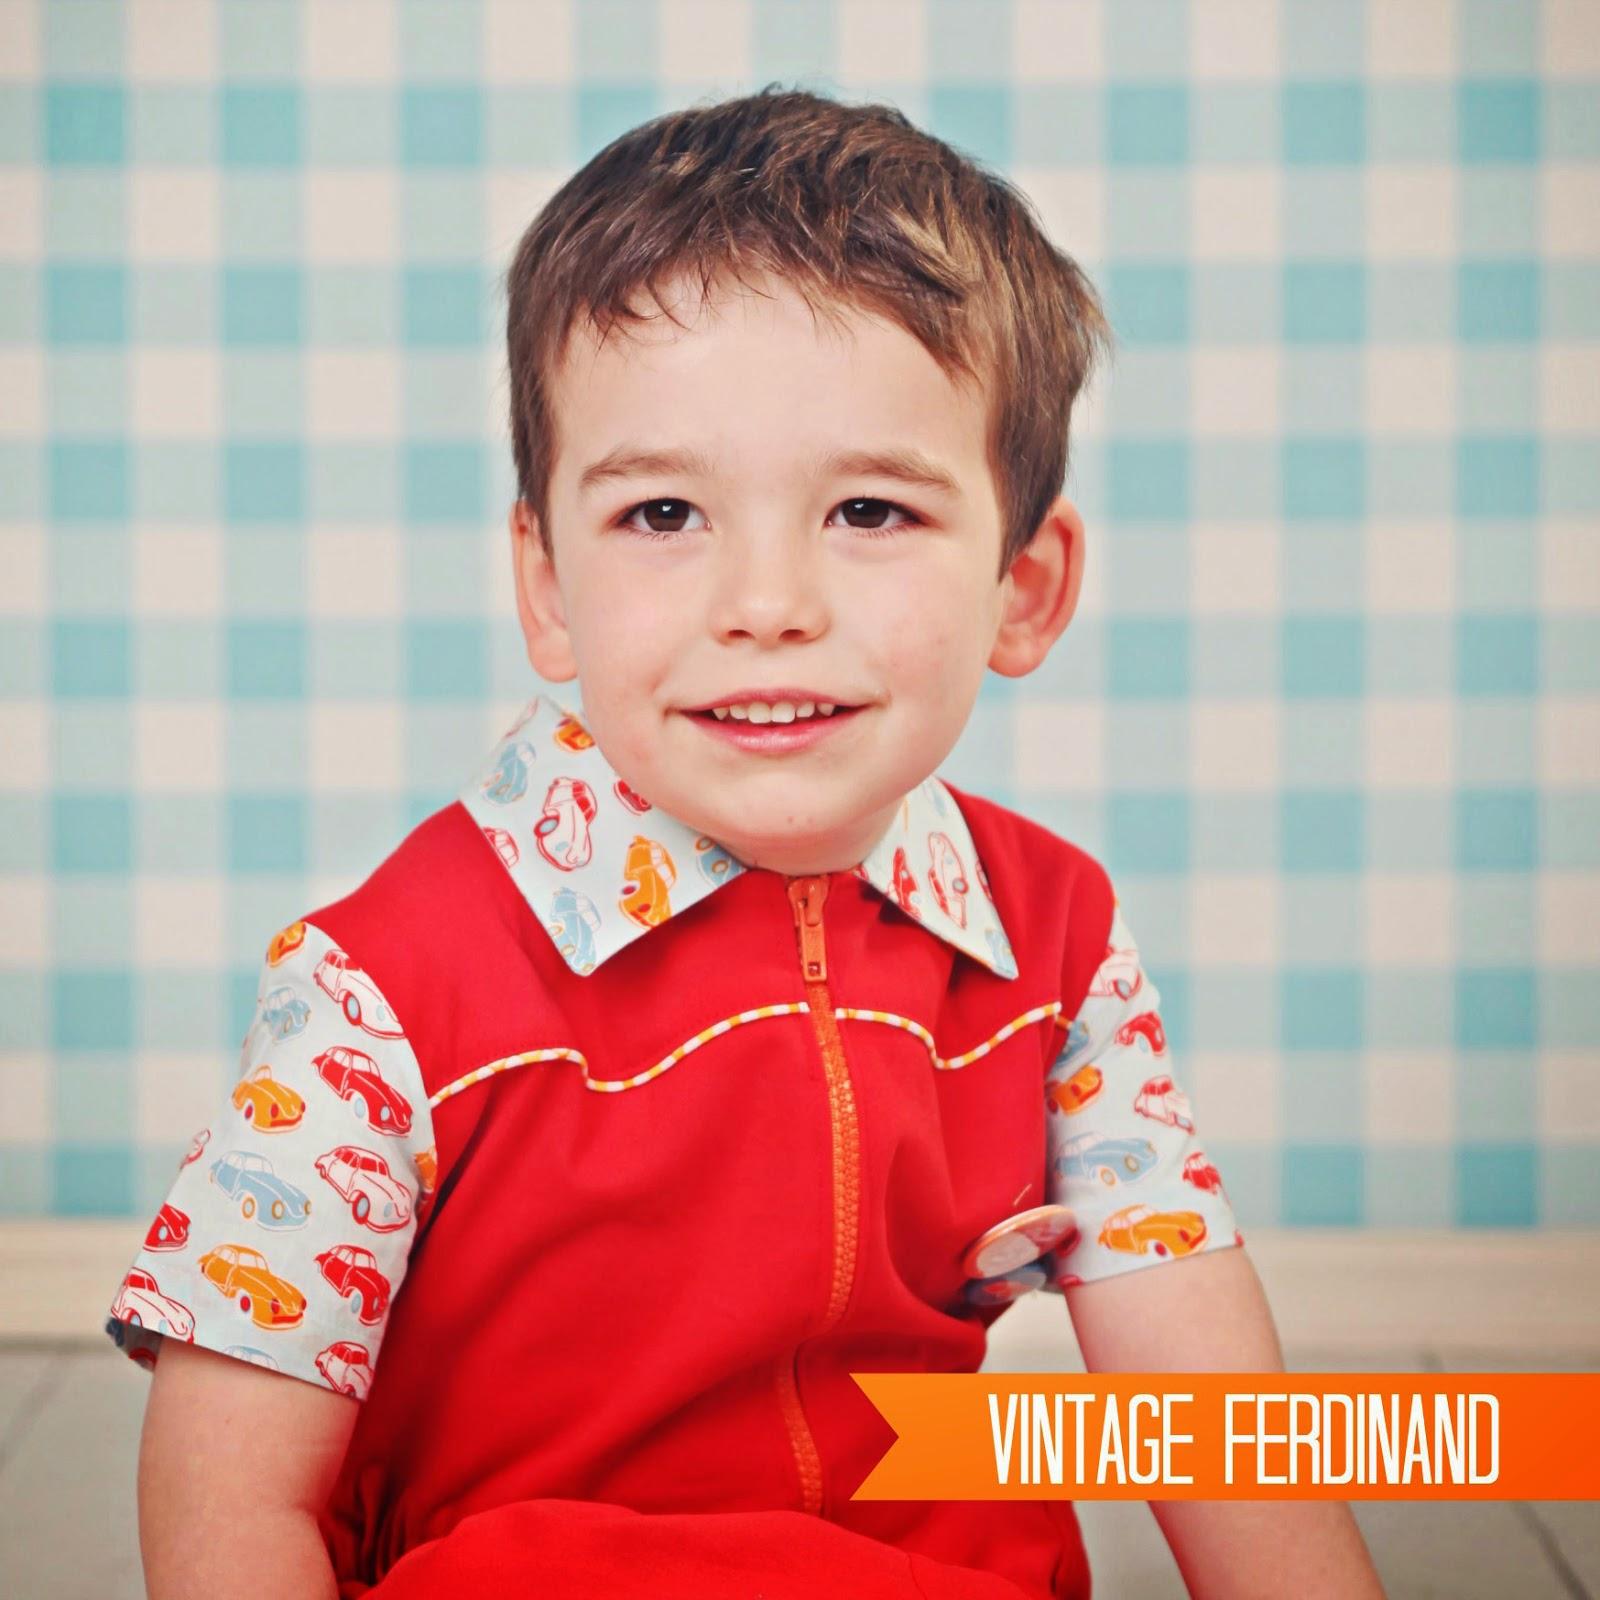 Vintage Ferdinand, Pieke Wieke for Soft Cactus